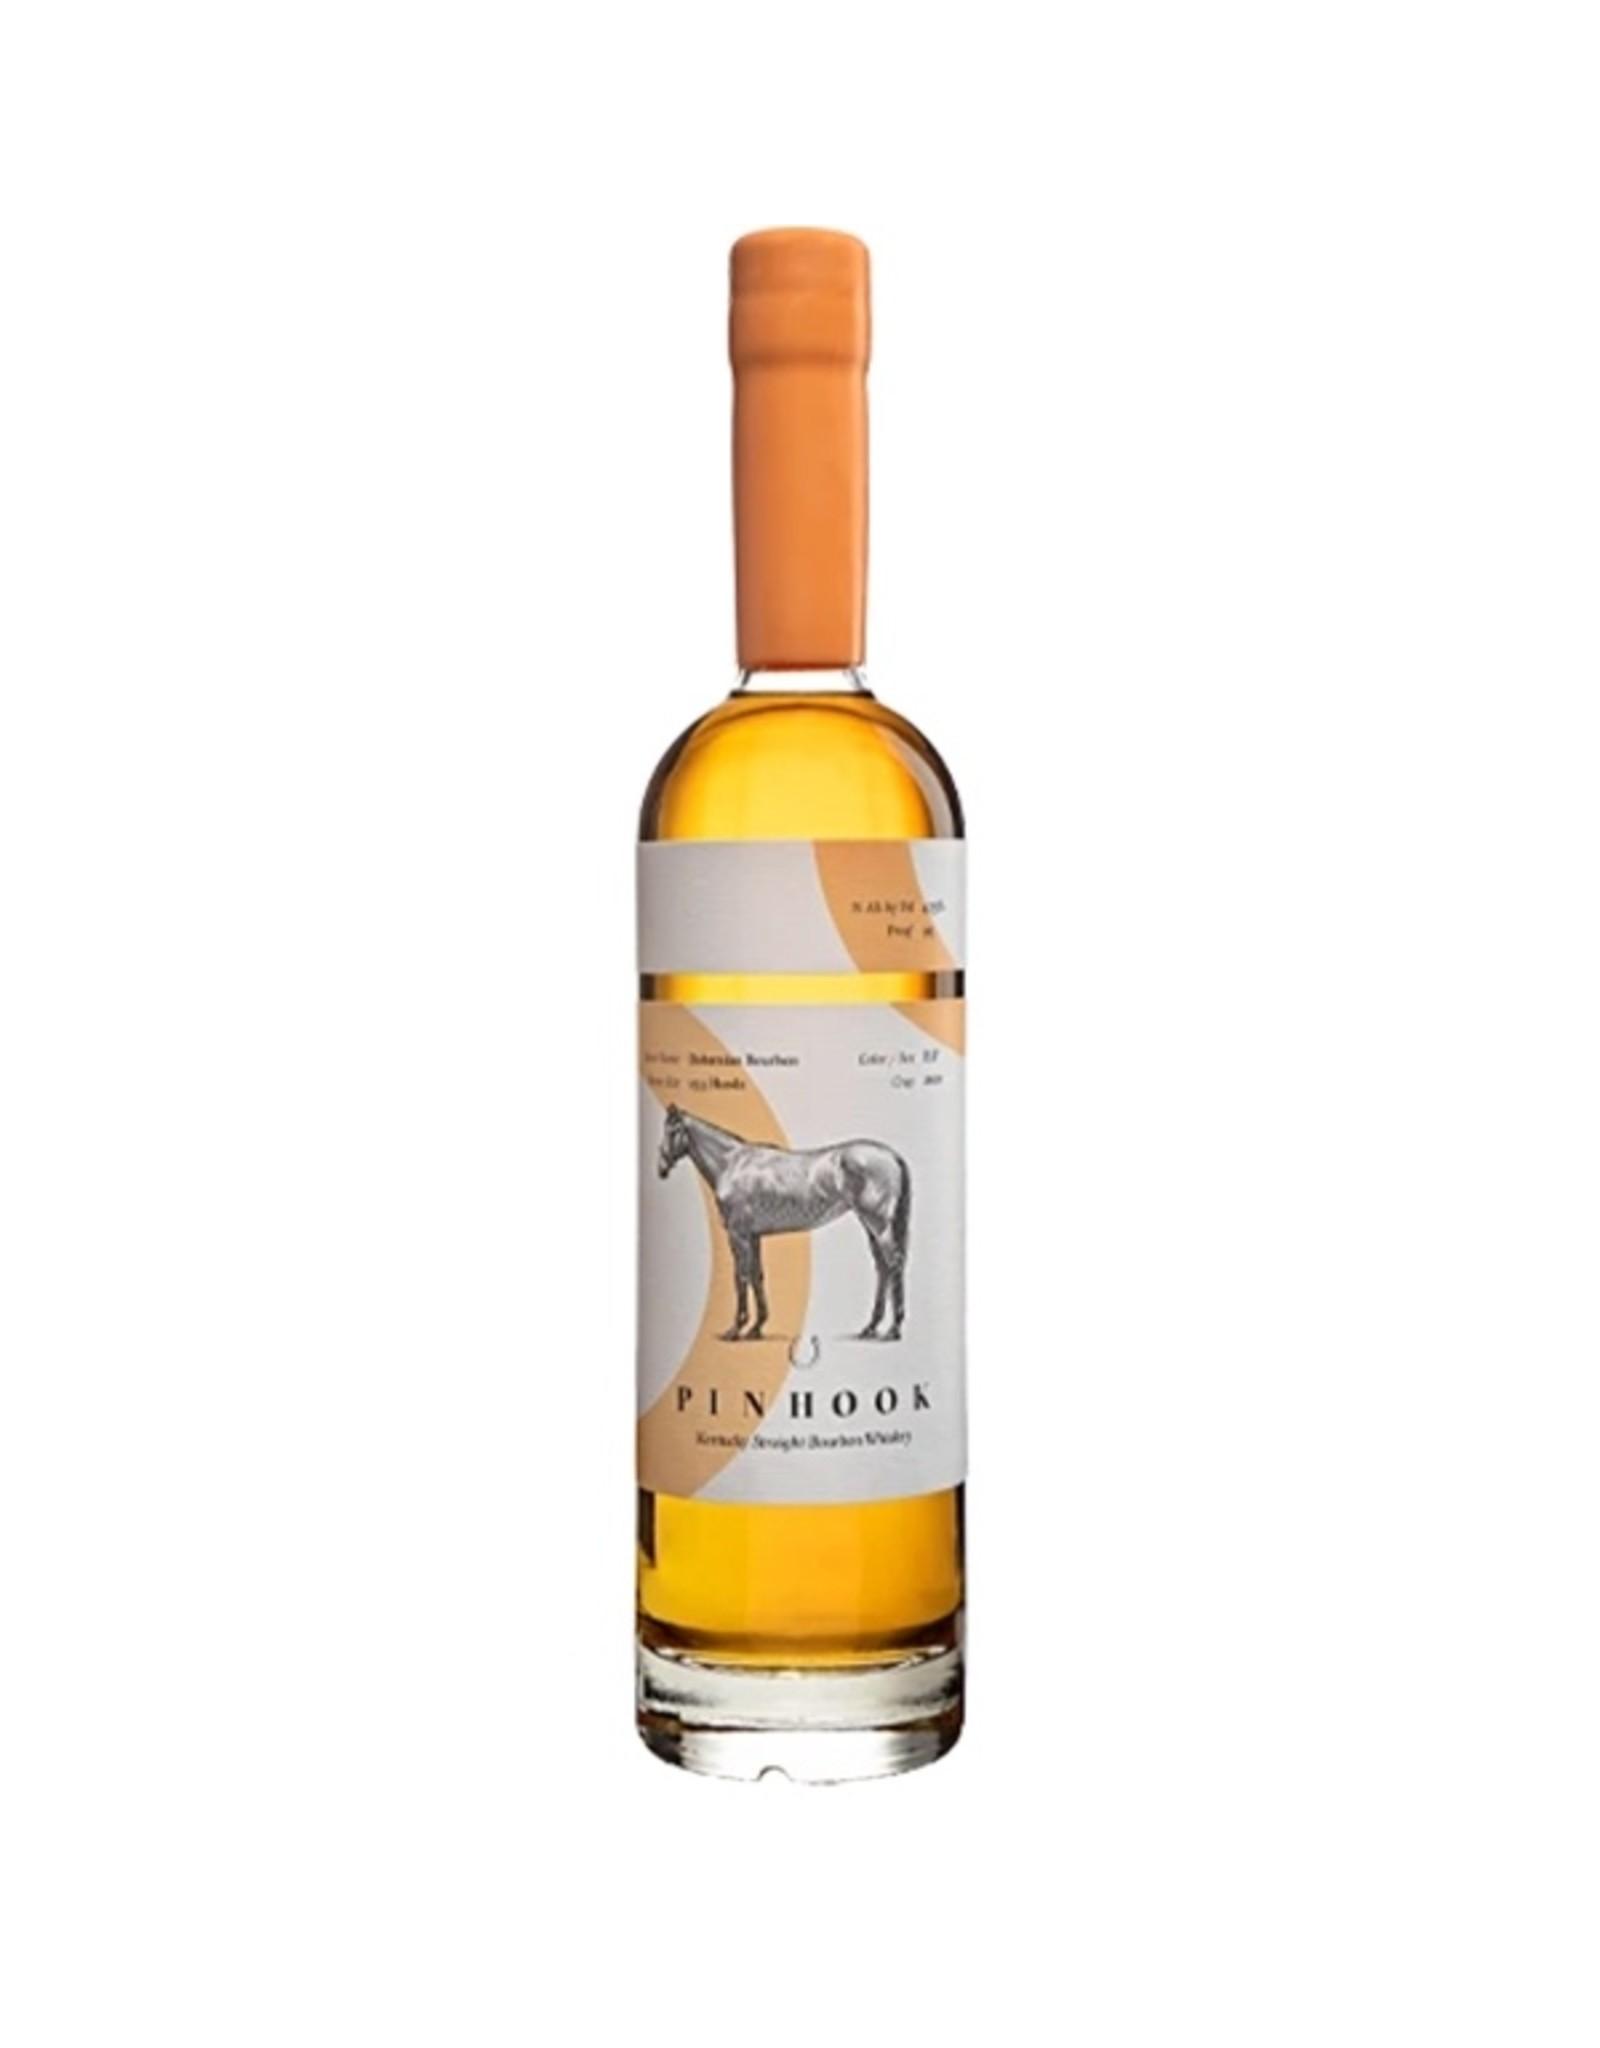 Pinhook ORANGE Bourbon Bohemian Crop 2020 95pf